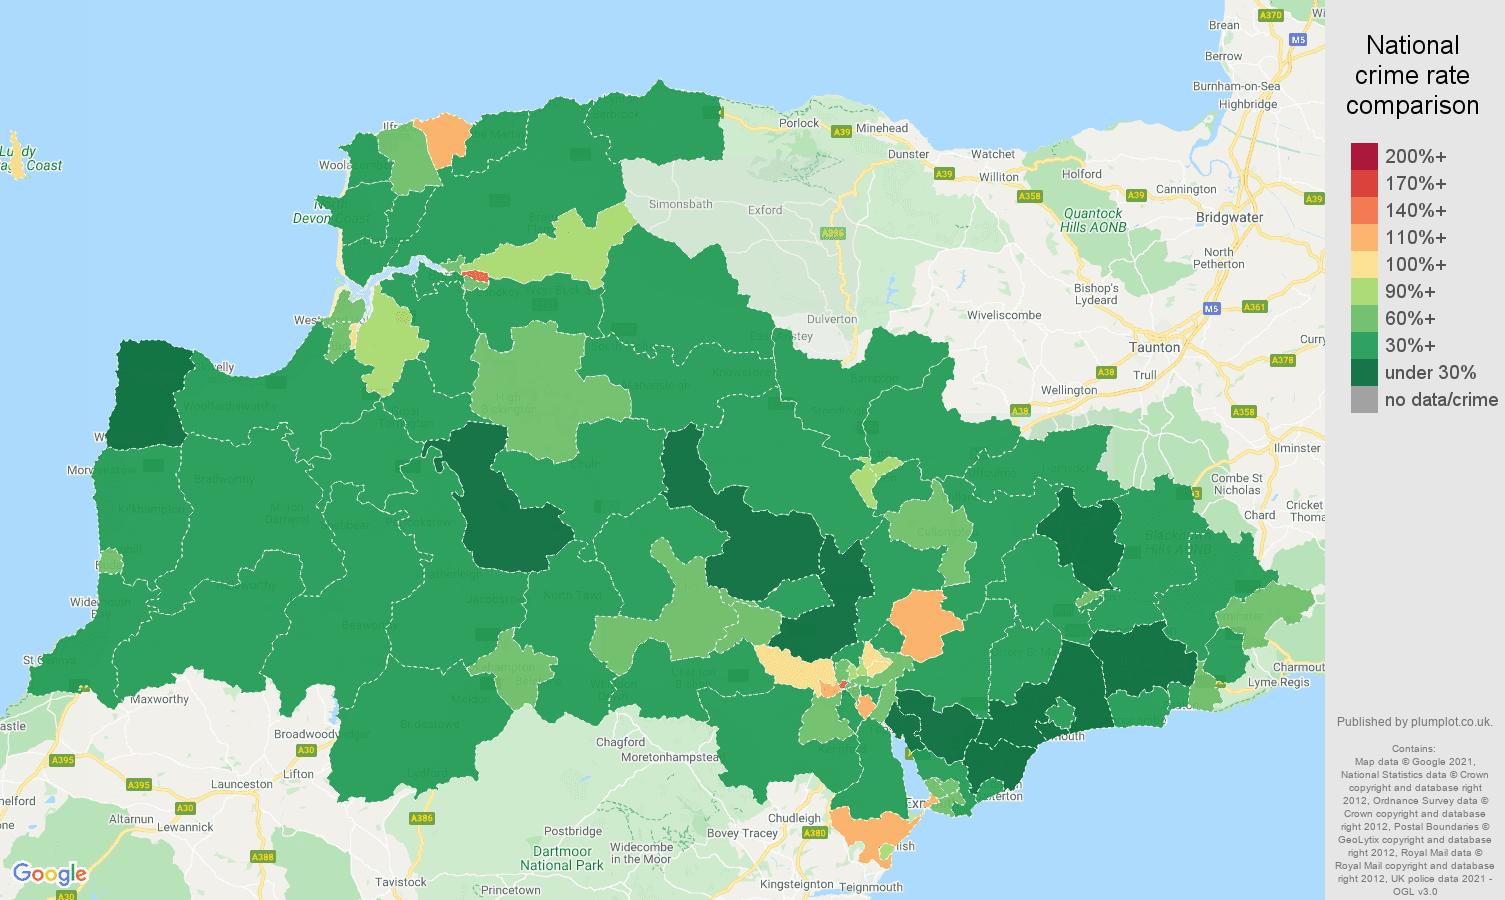 Exeter violent crime rate comparison map